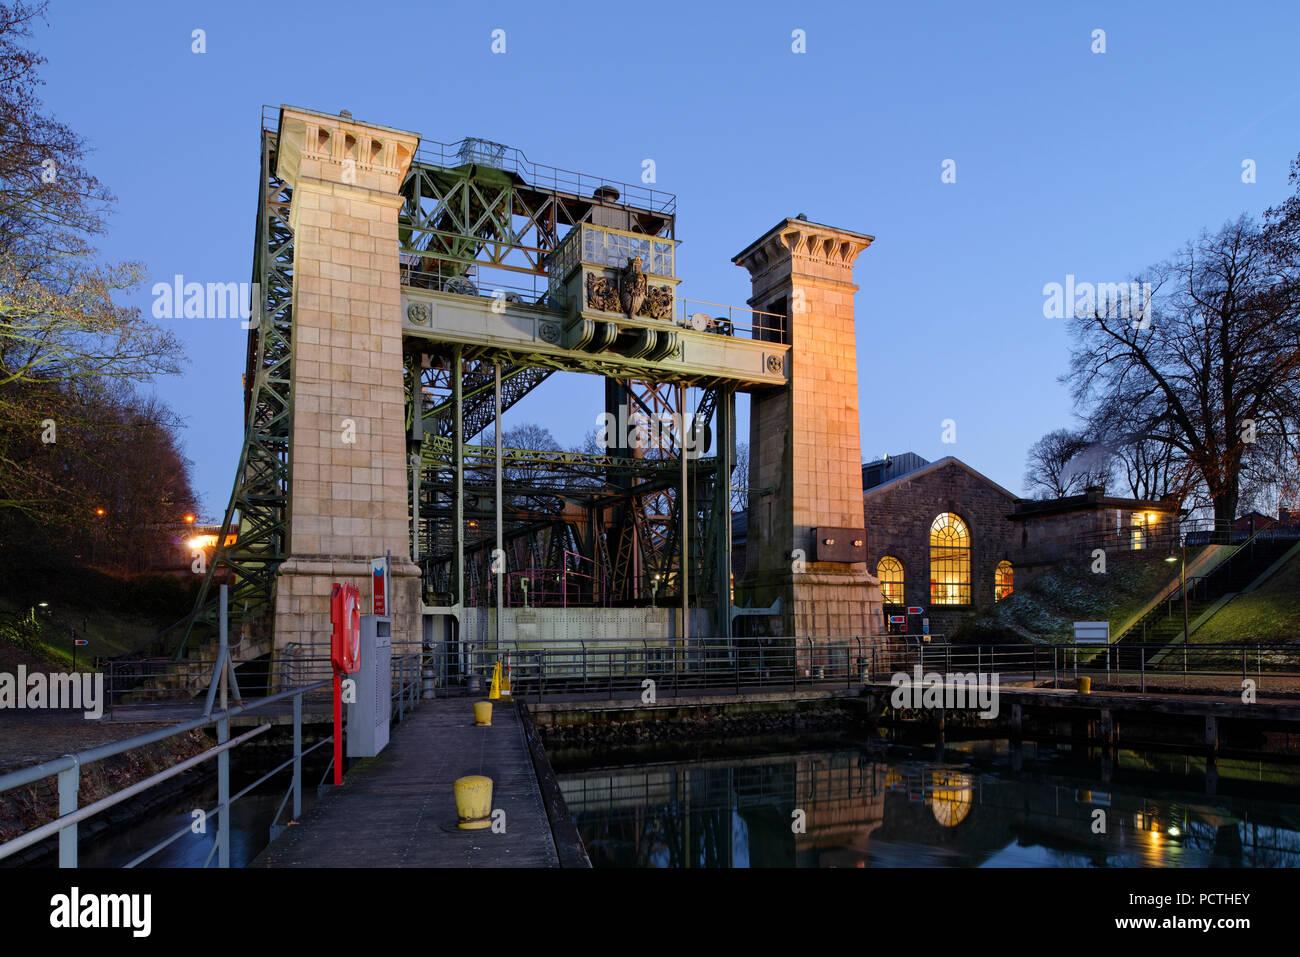 LWL - Industrial Museum, Henrichenburg boat lift on the Dortmund-Ems Canal in evening light, Waltrop - Oberwiese, North Rhine-Westphalia, Germany Stock Photo